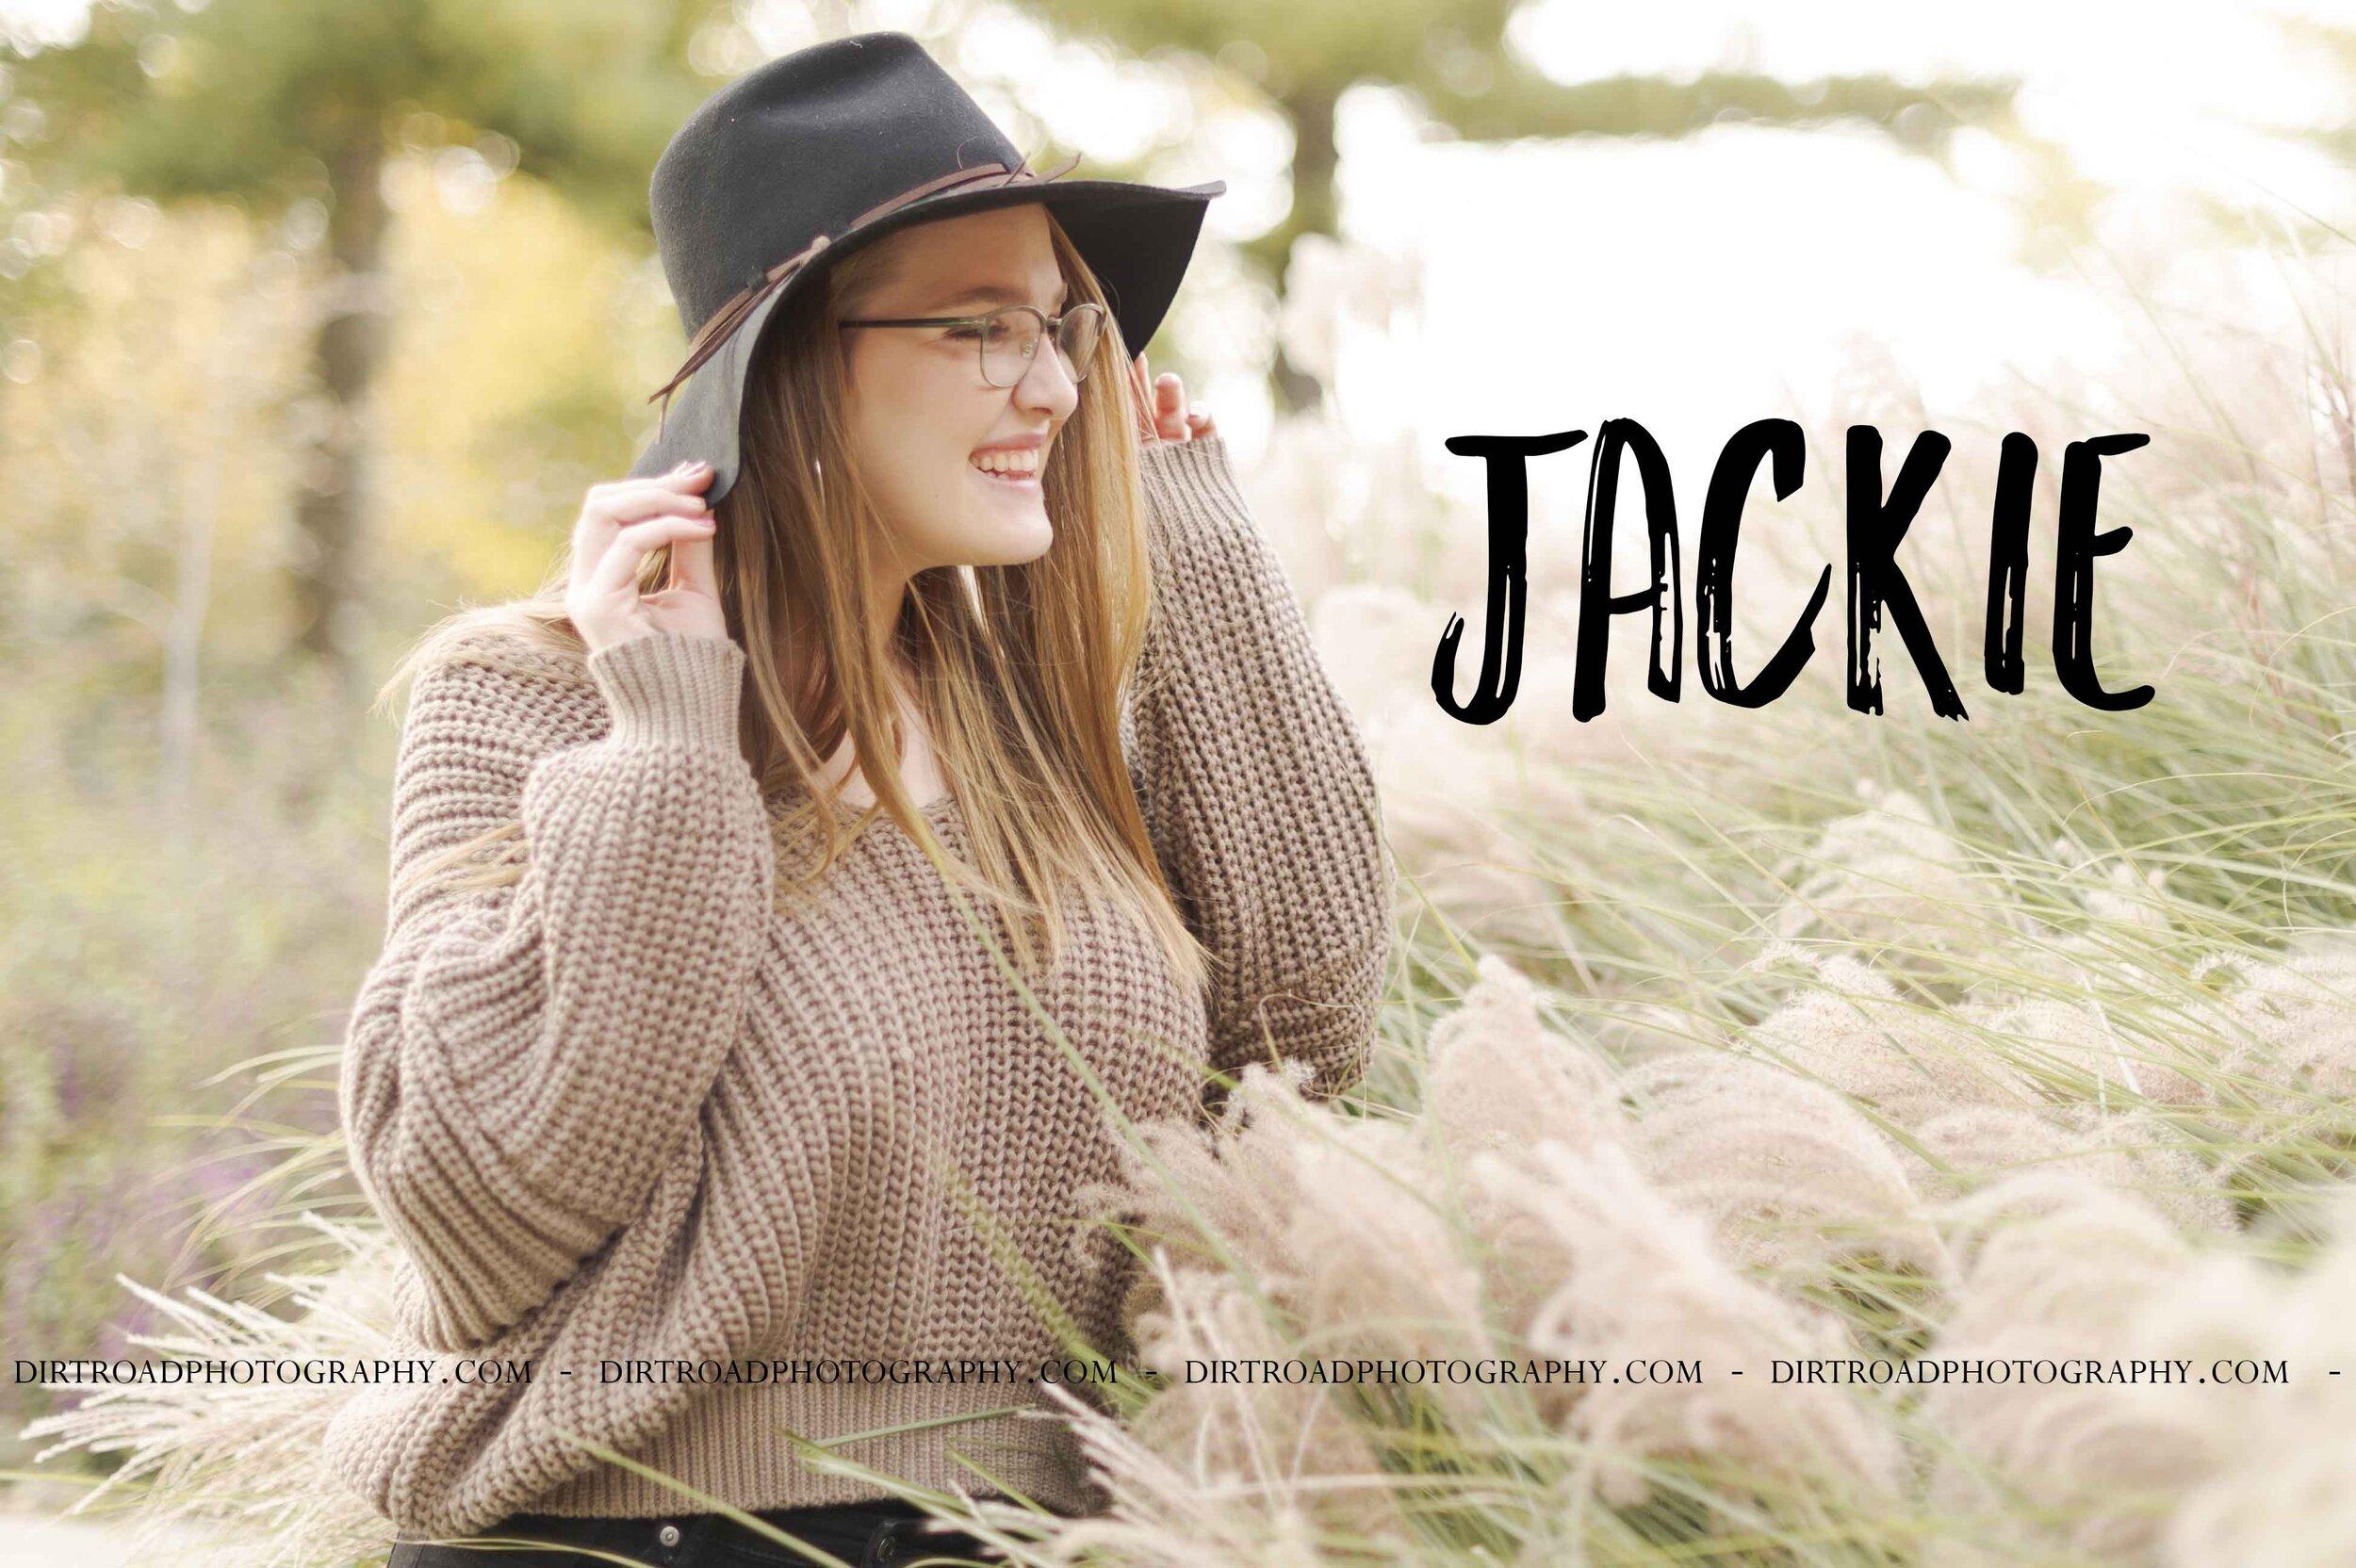 Wilber Nebraska Portrait Photographer | Jackie | Wilber-Clatonia High School | Southeast Nebraska High School Senior Photos